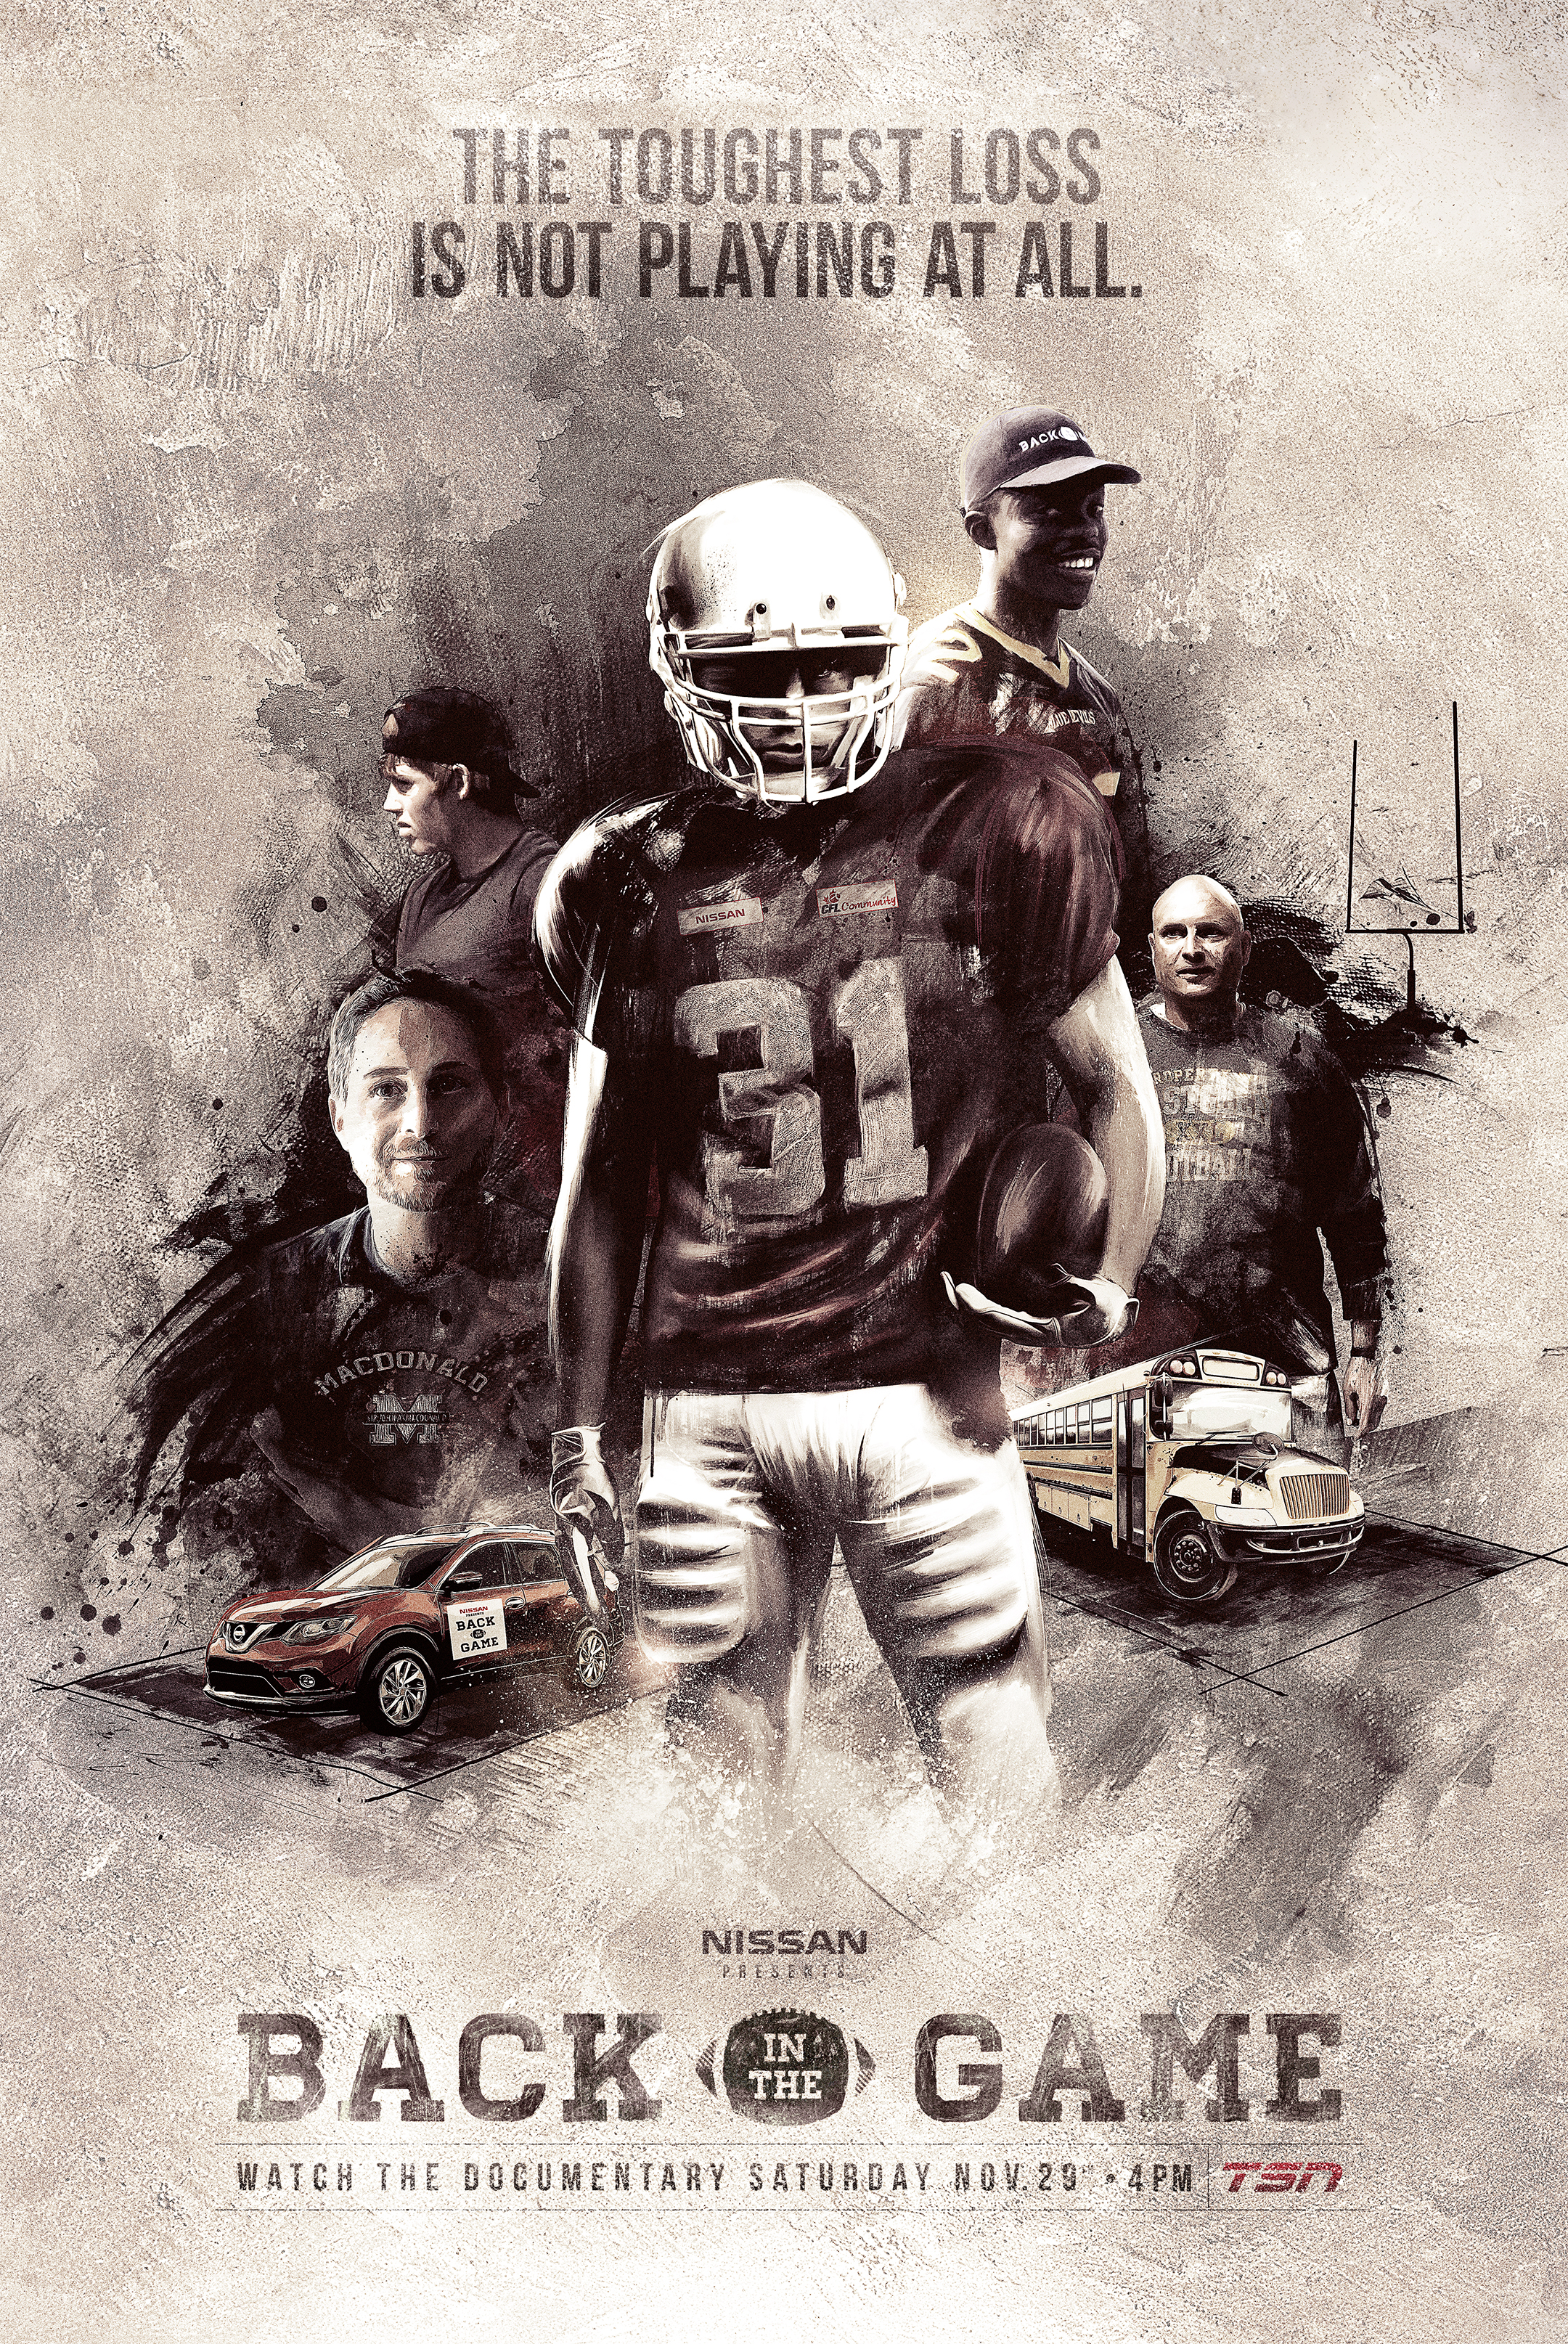 CFL_Poster_BackInTheGrame_Movie_Poster.jpg